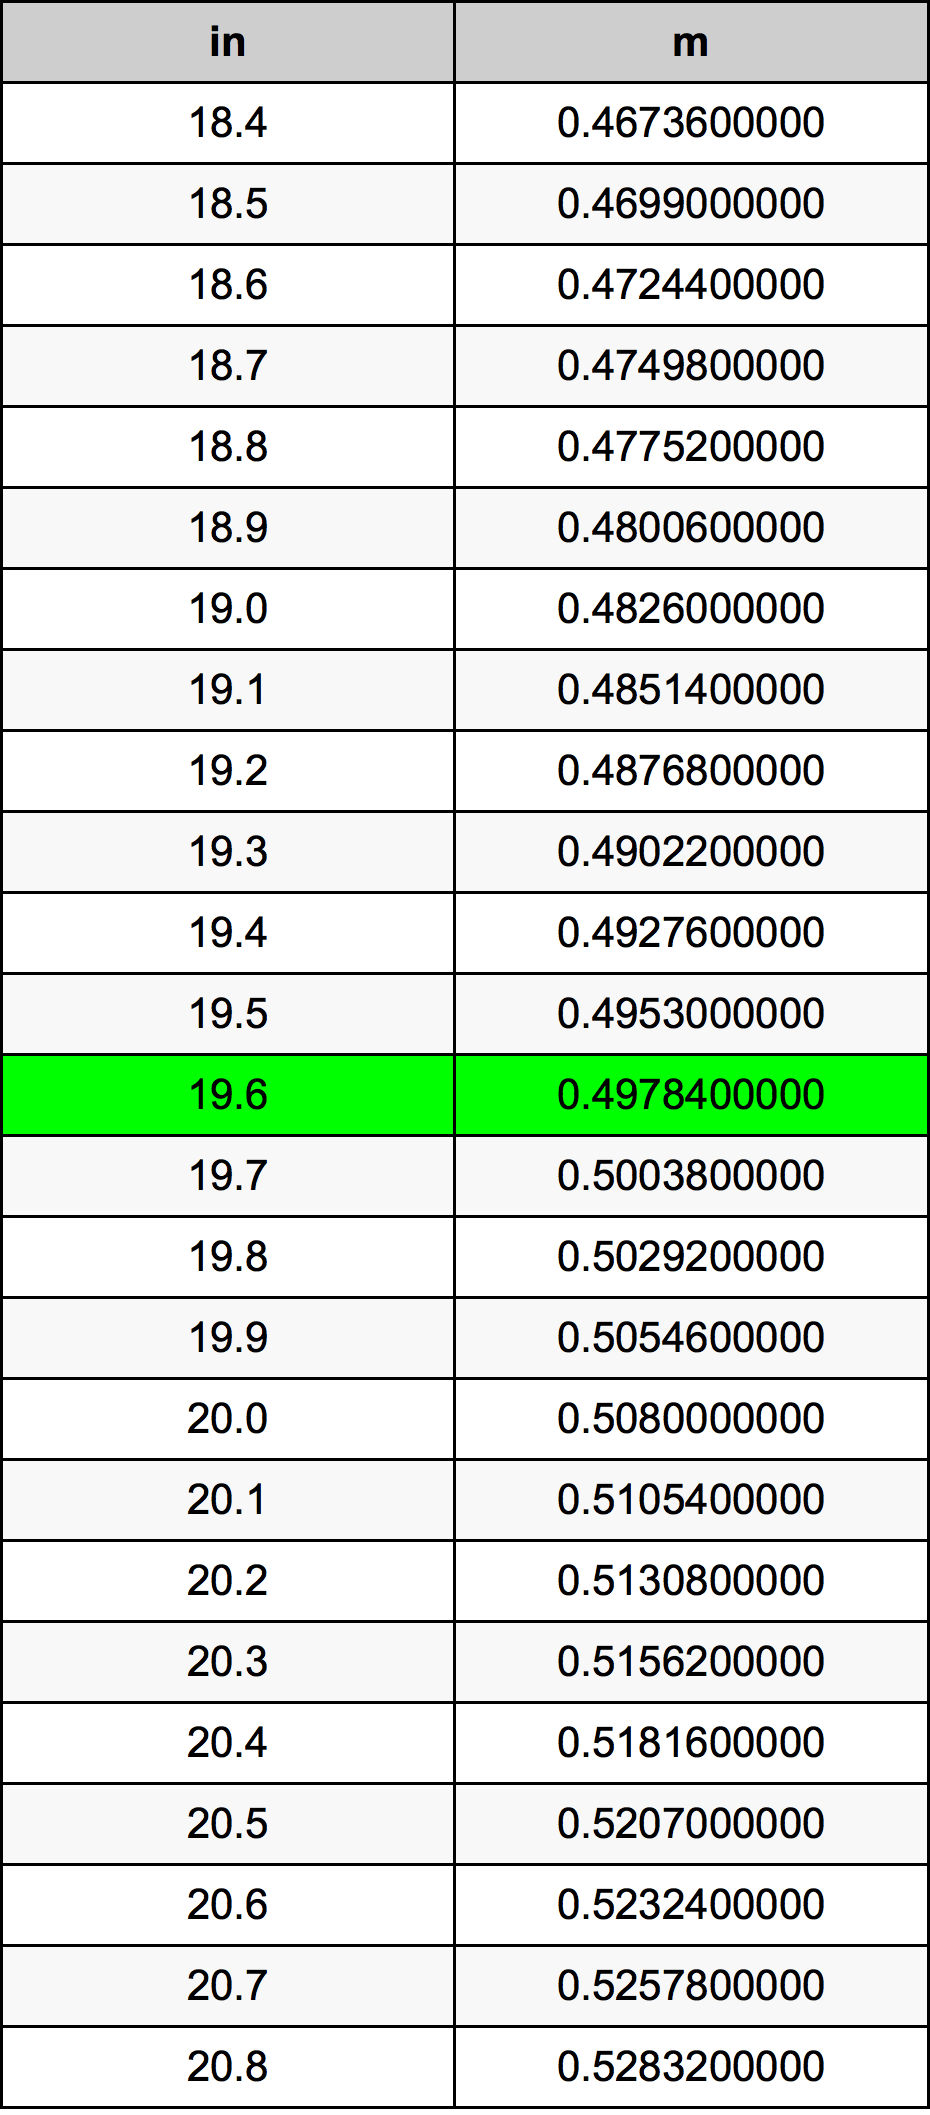 19.6 дюйм Таблица преобразования